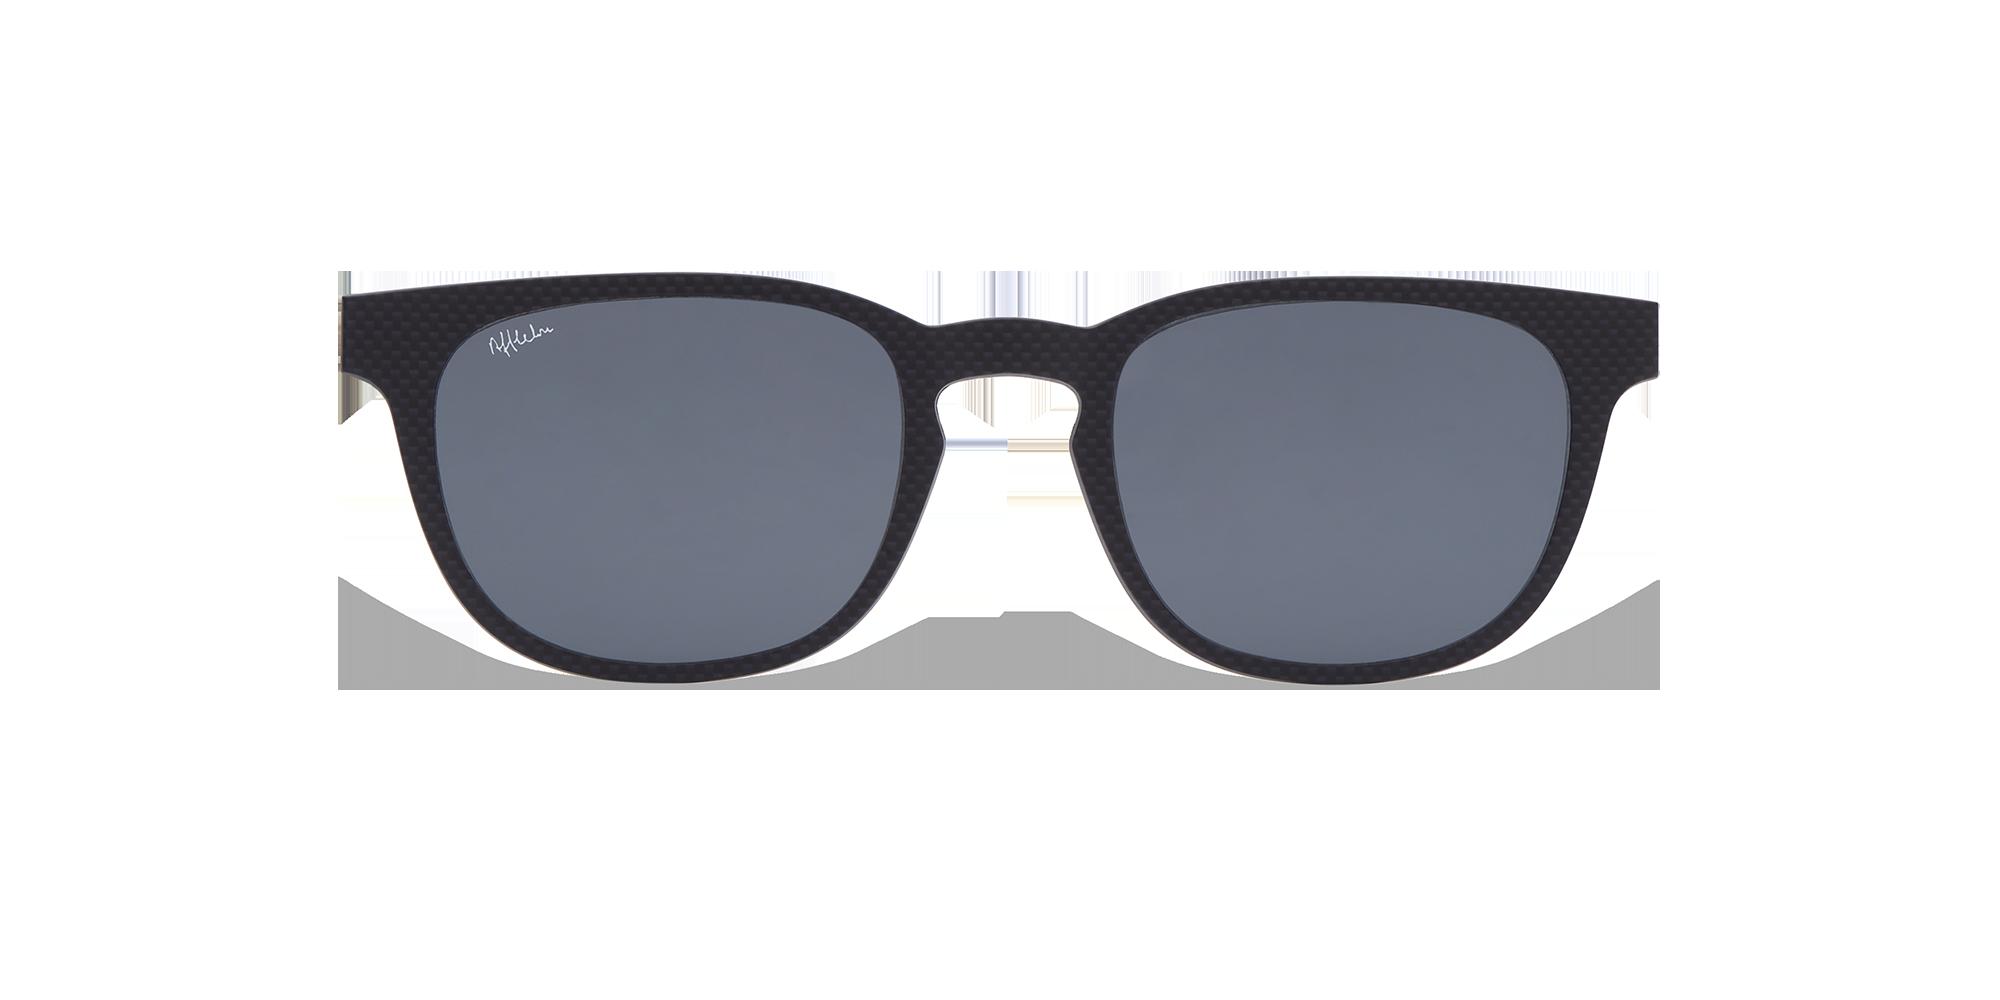 afflelou/france/products/smart_clip/clips_glasses/TMK33SUBK015120.png